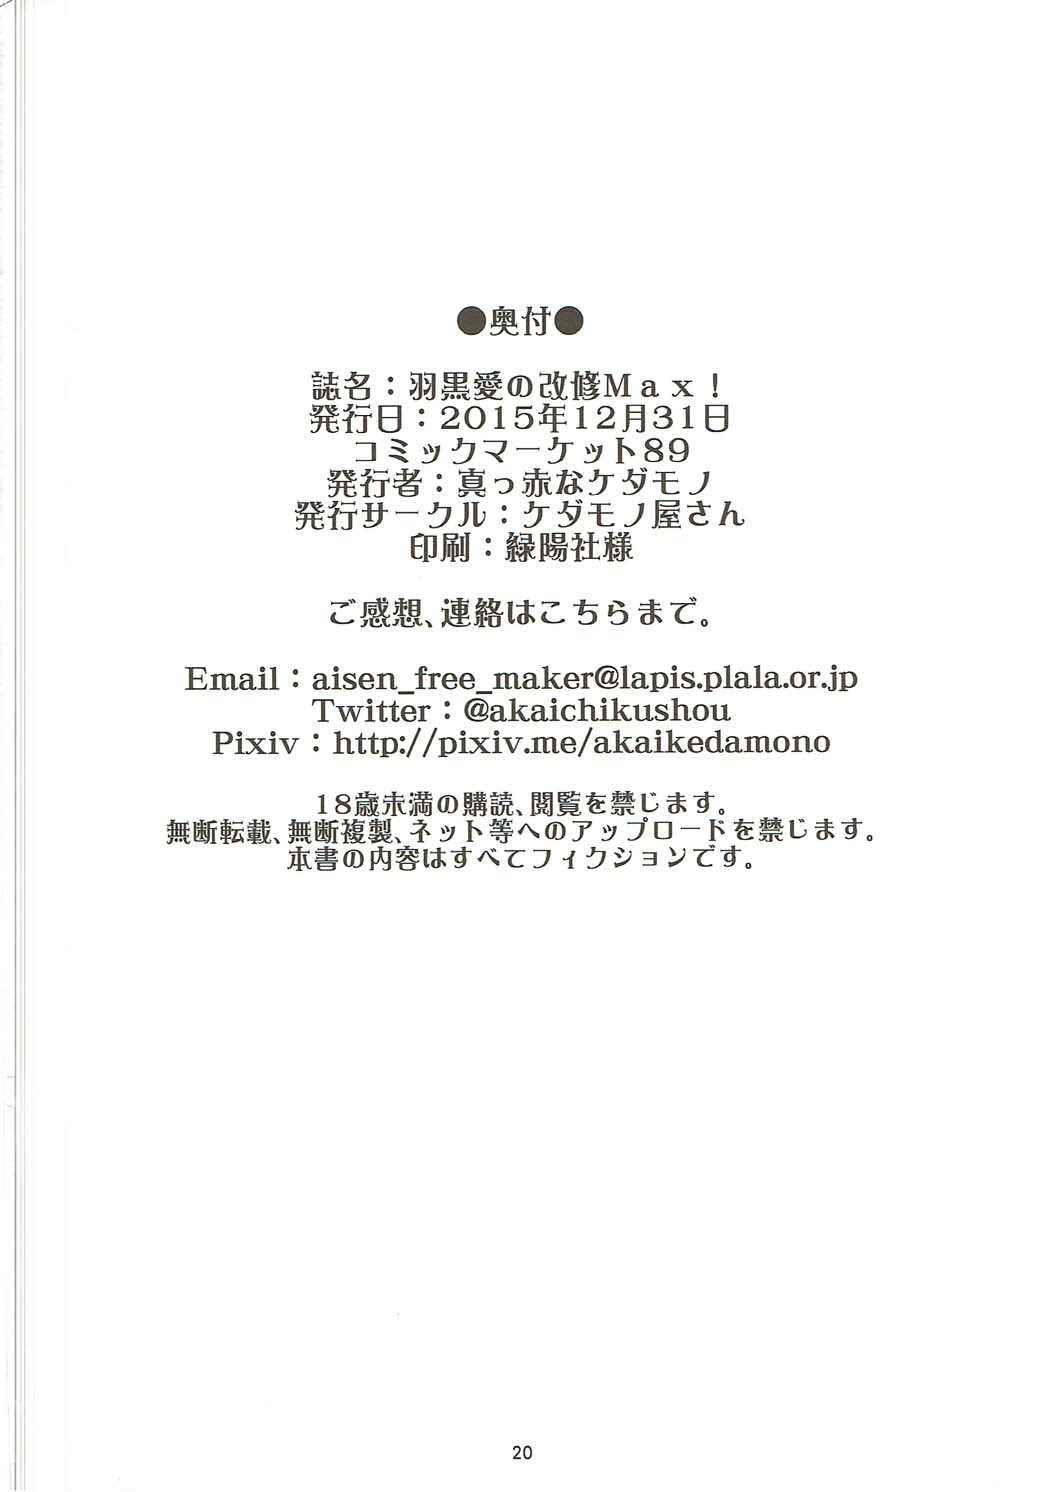 Haguro Ai no Kaishuu Max! 20